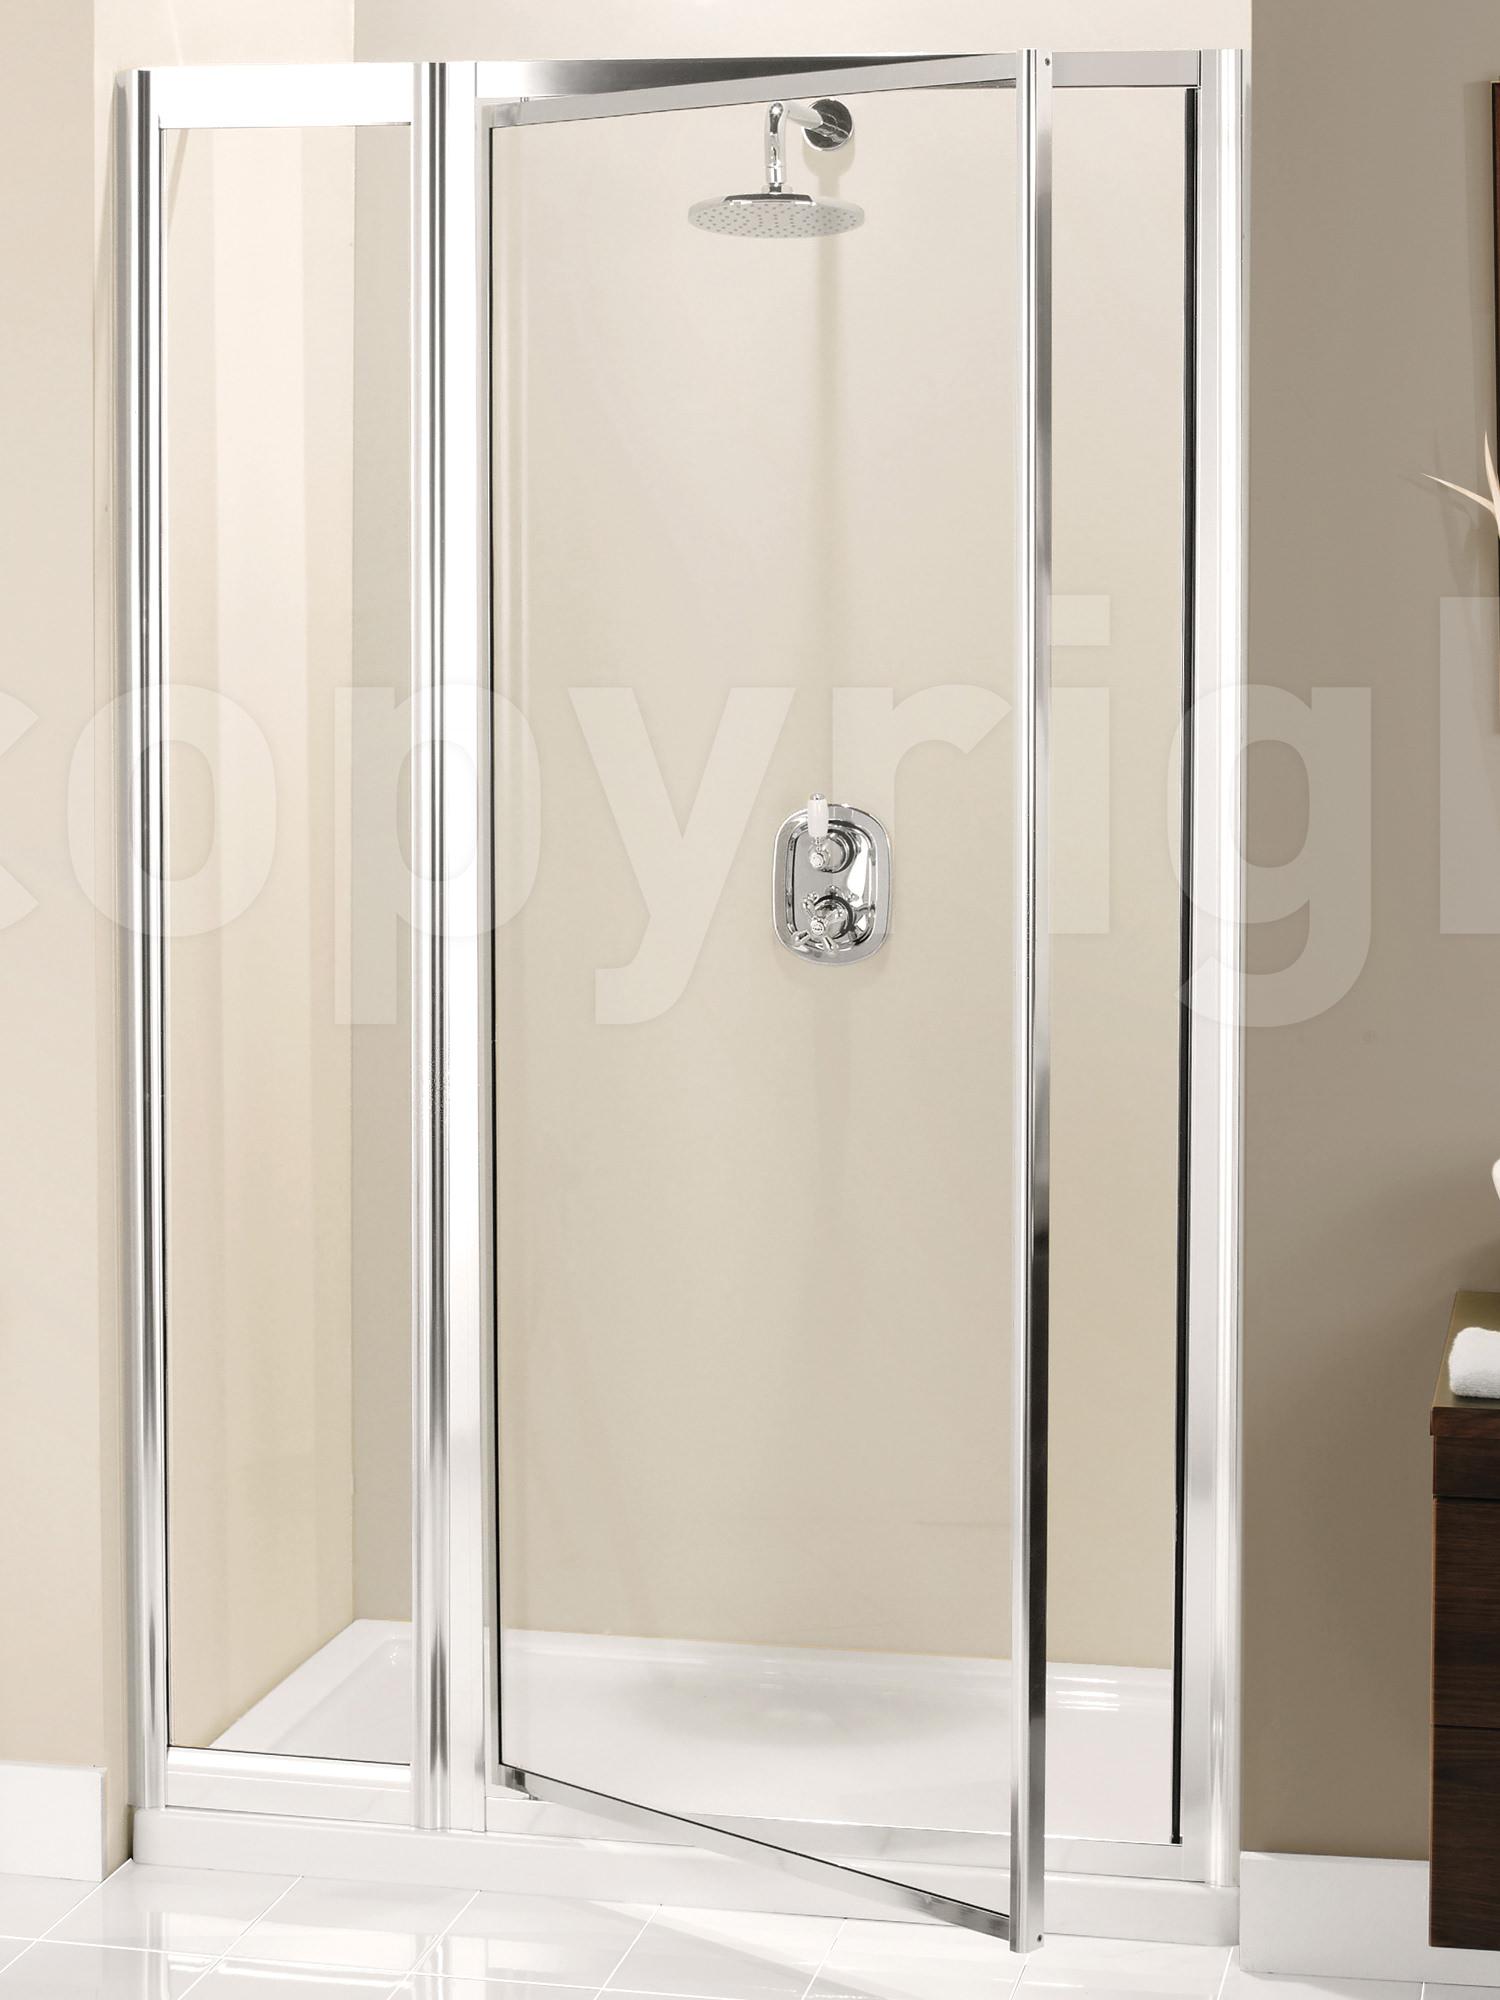 Entry Doors Product : Simpsons supreme mm pivot shower door with inline panel